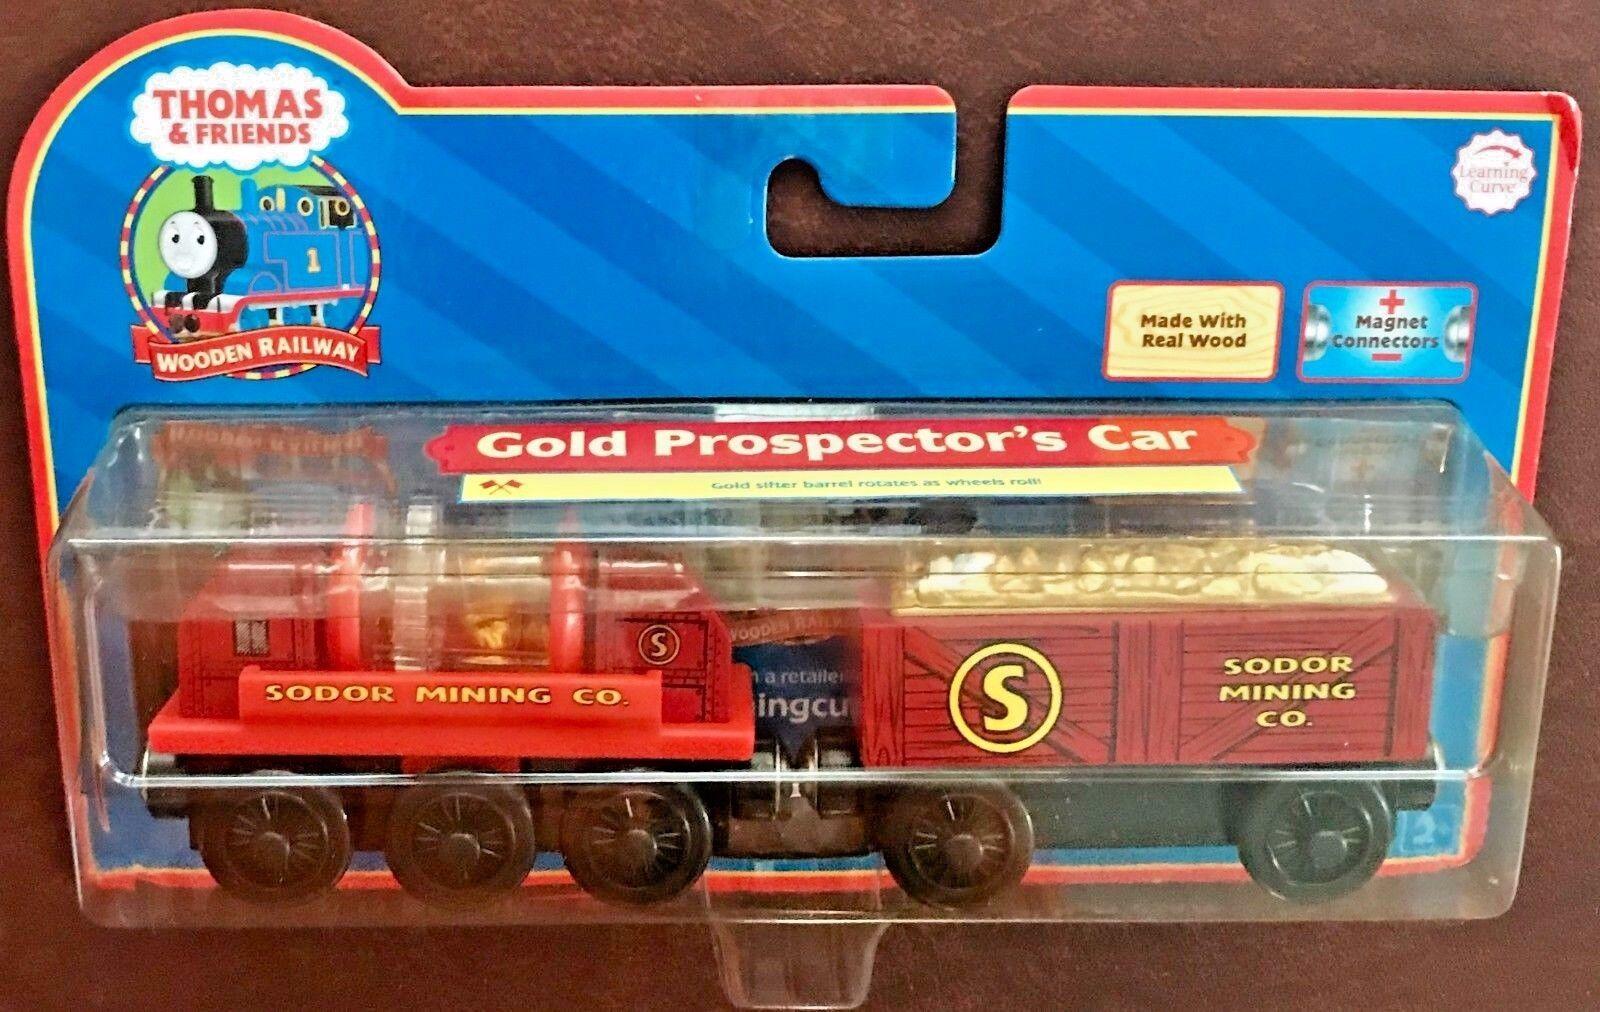 Thomas & Friends Wooden Railway Gold Prospector's Car  LC99177